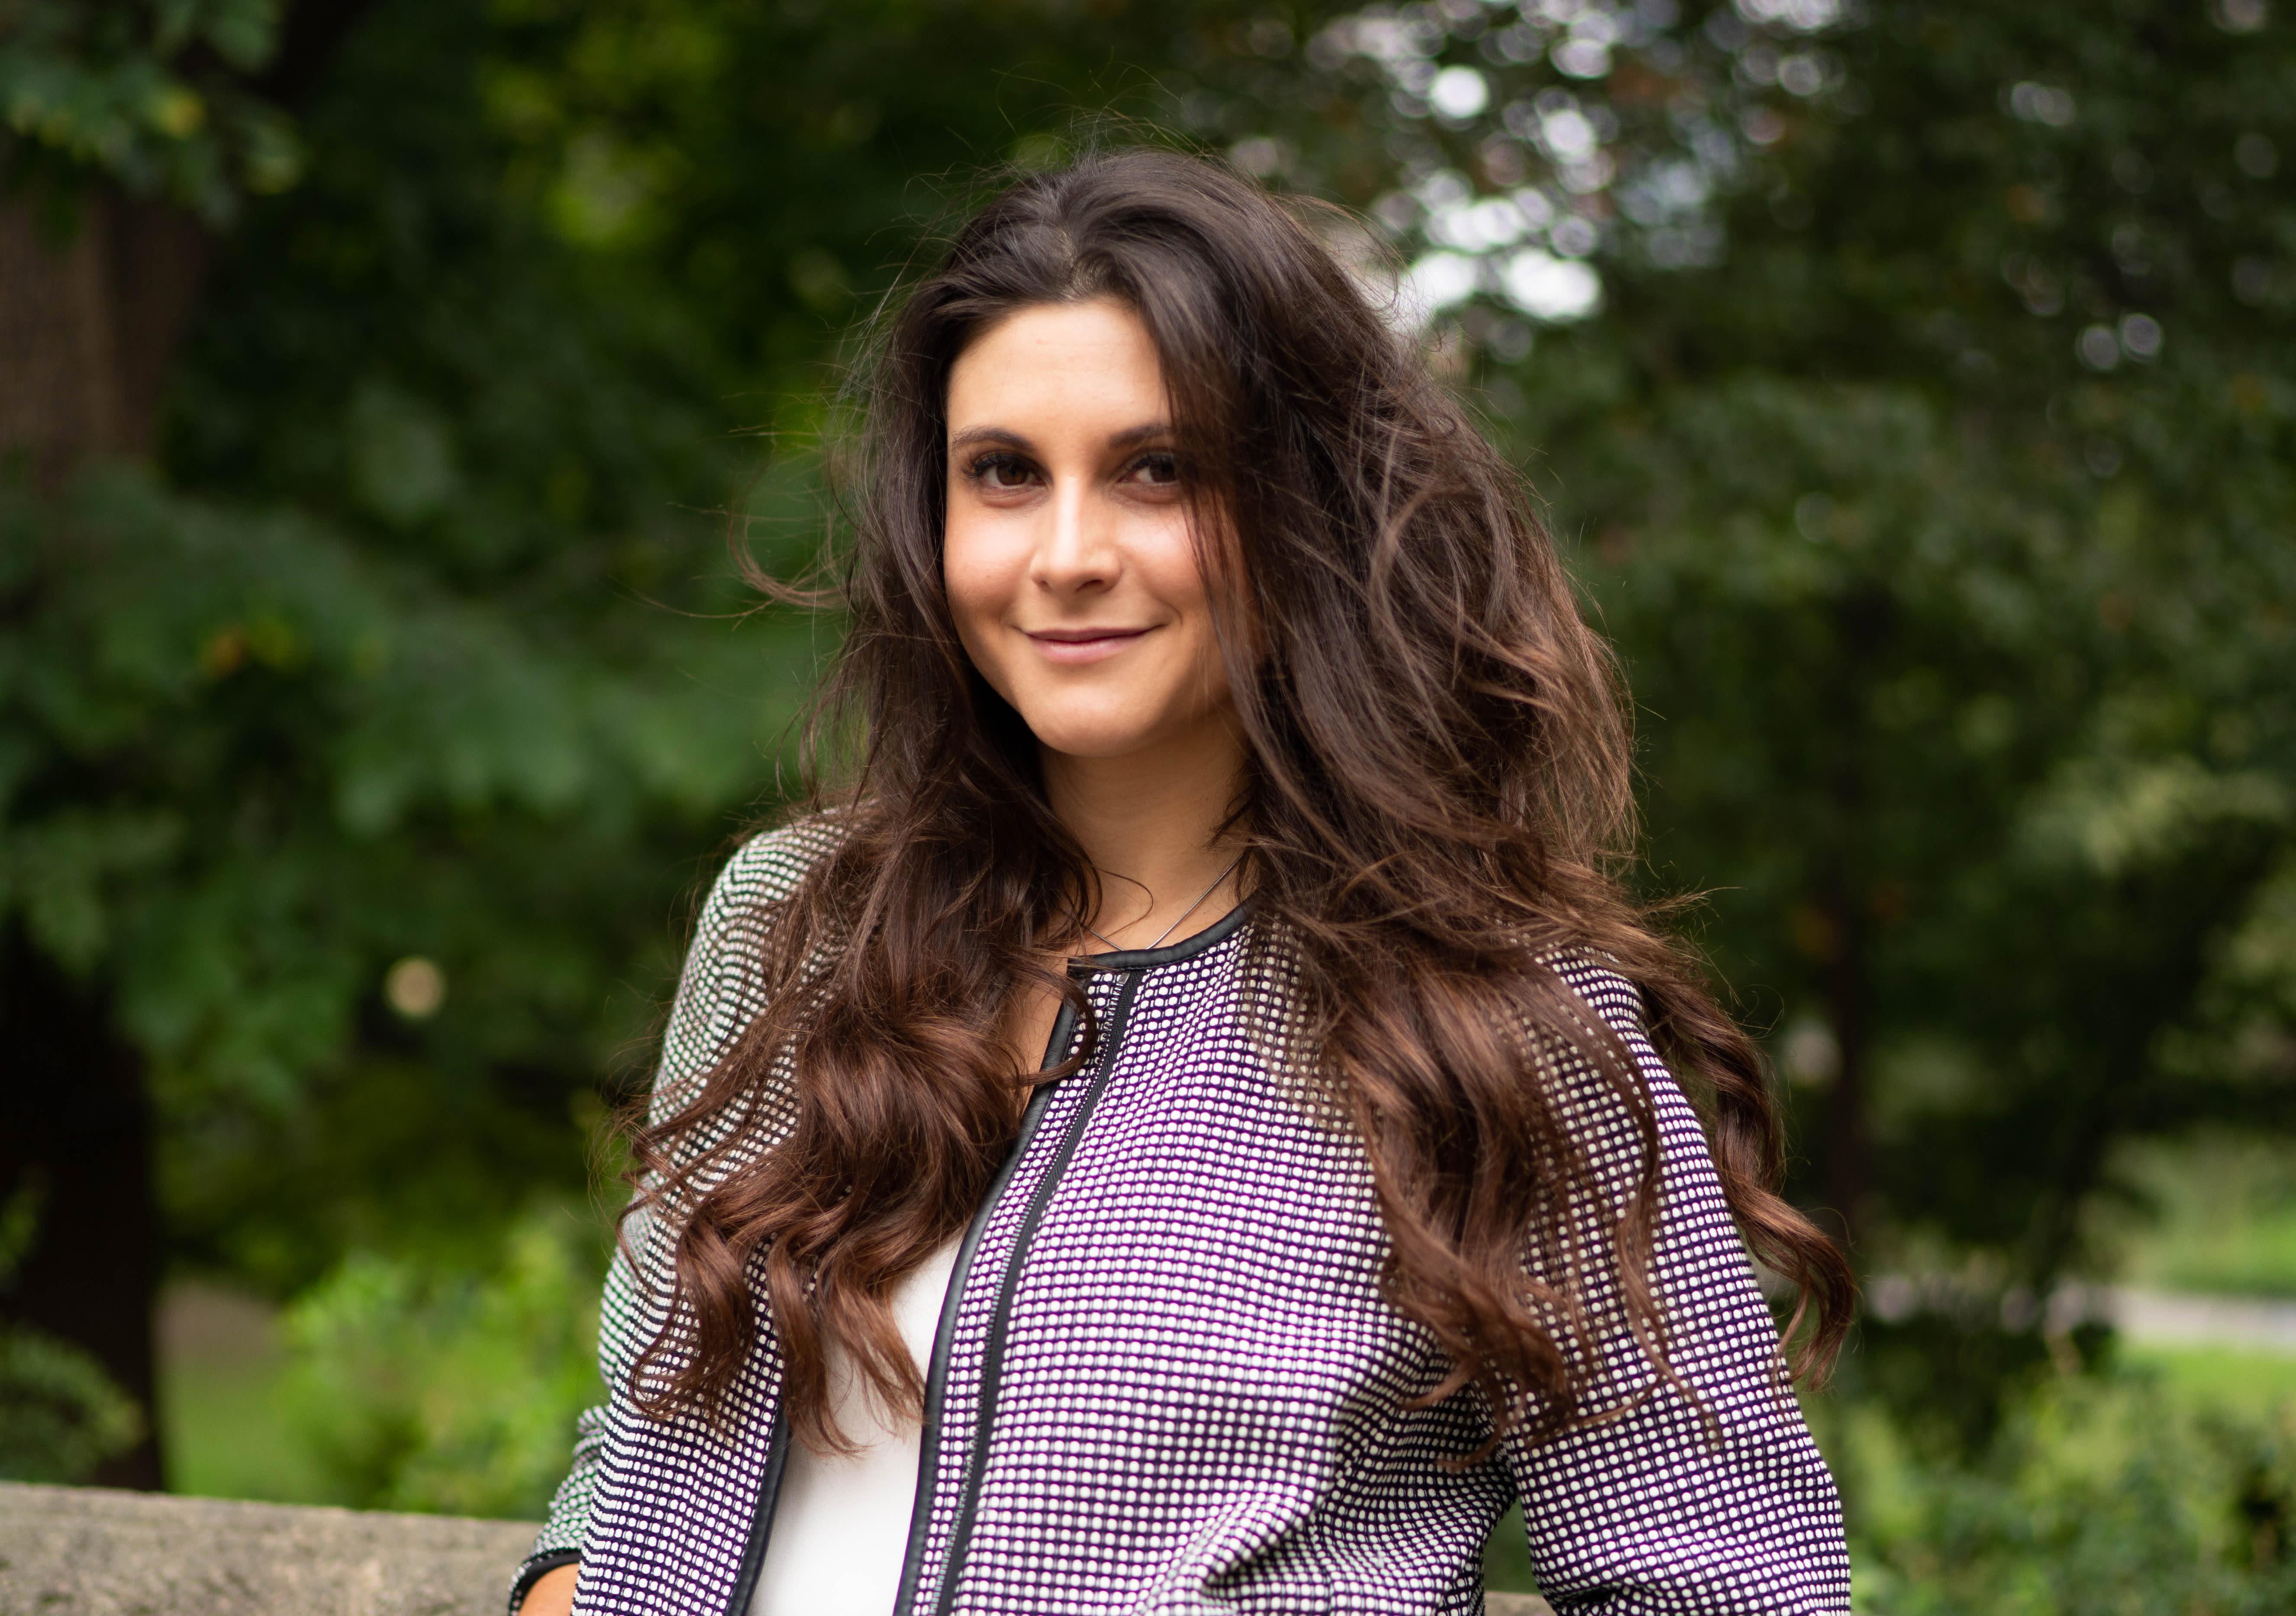 Andreessen Horowitz taps 30-year-old partner Arianna Simpson to help run world's largest crypto fund